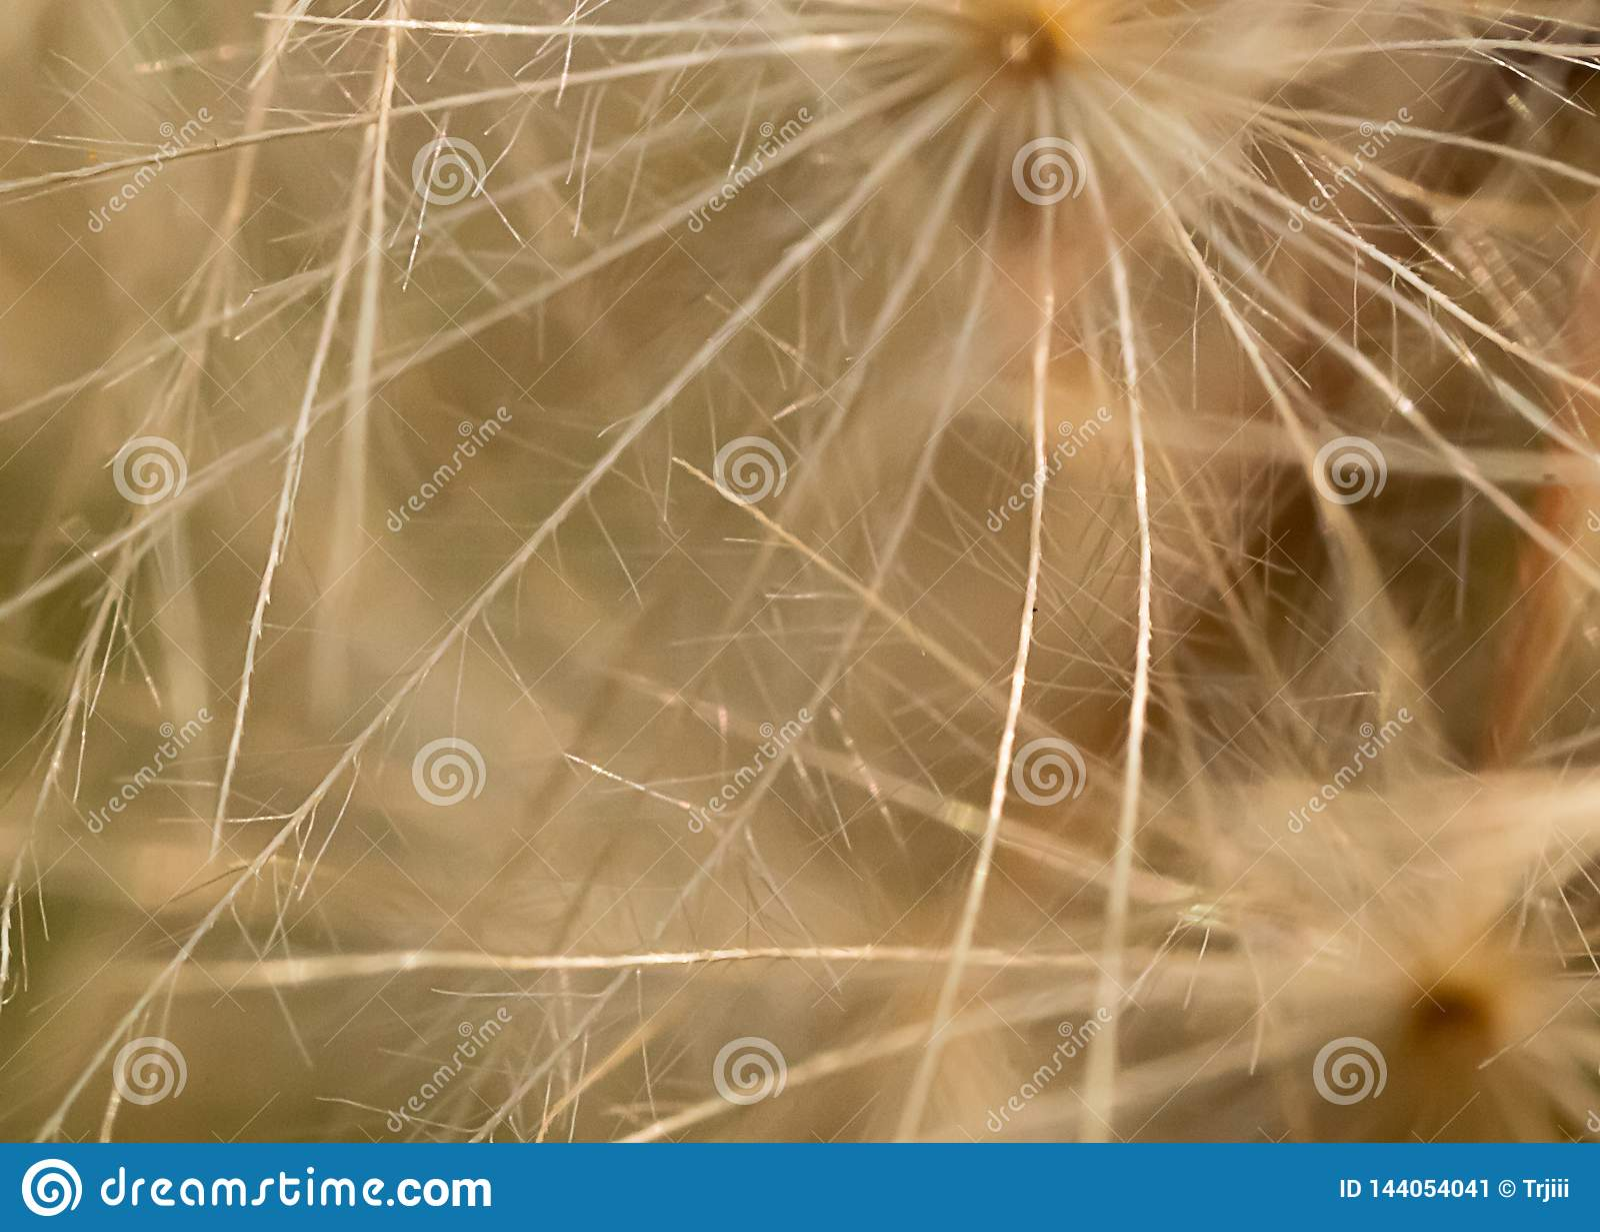 Dandelion seed macro patern in white